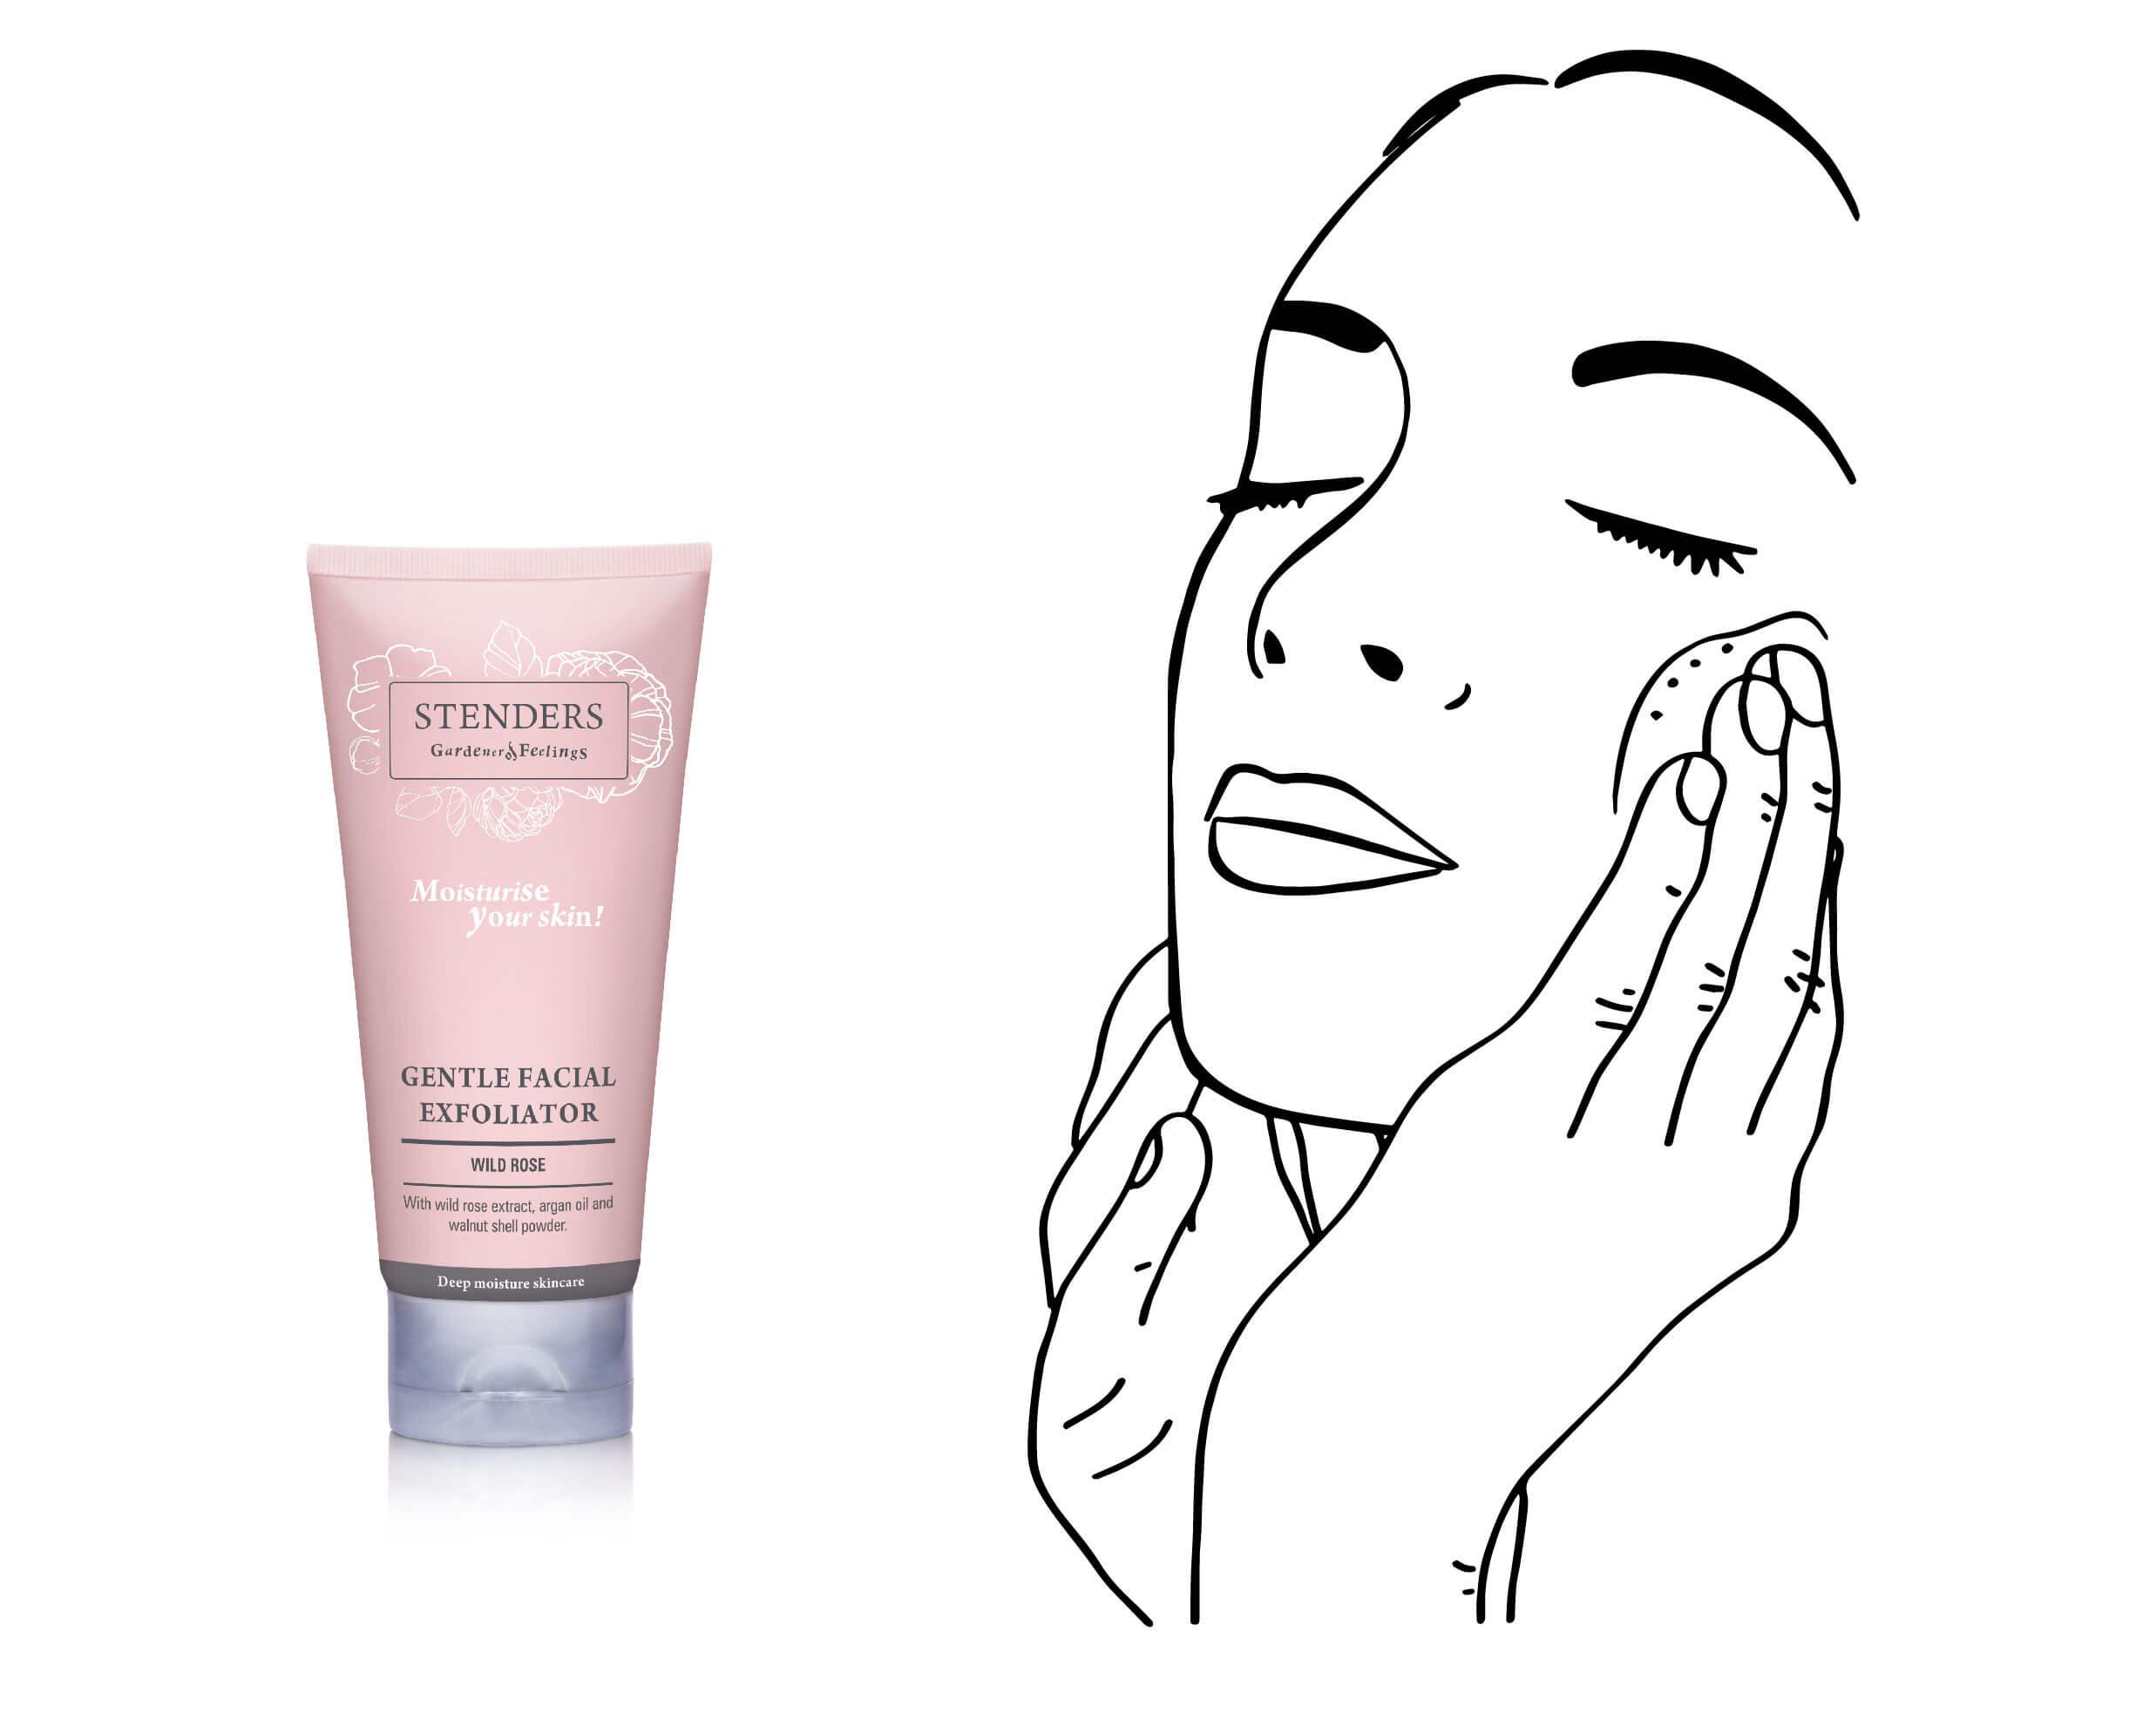 Use Wild Rose Gentle Facial Exfoliator